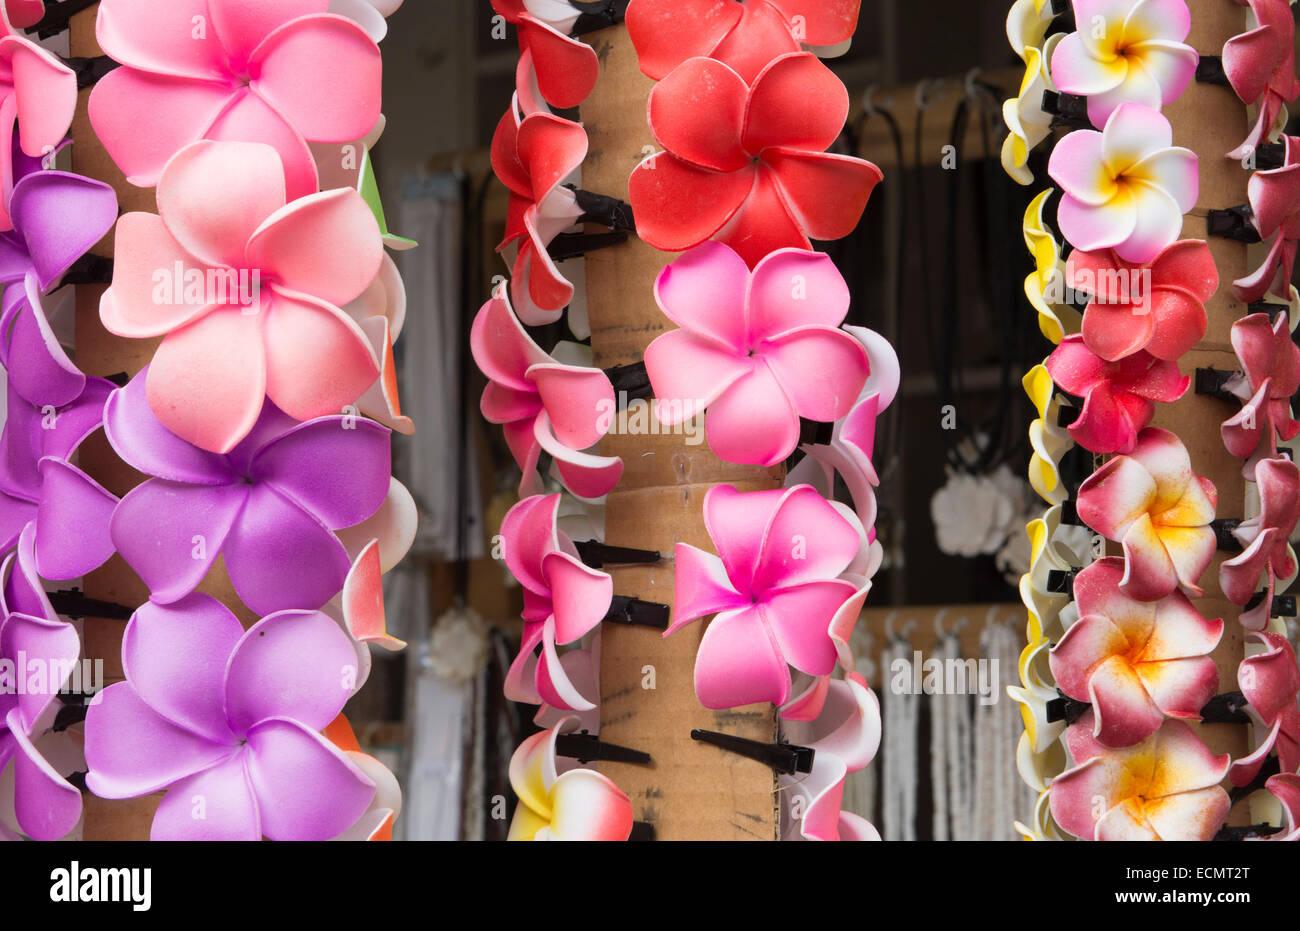 Kona hawaii kailua kona alii drive shops at kona village leis kona hawaii kailua kona alii drive shops at kona village leis flowers for sale to tourists in shopping center colorful izmirmasajfo